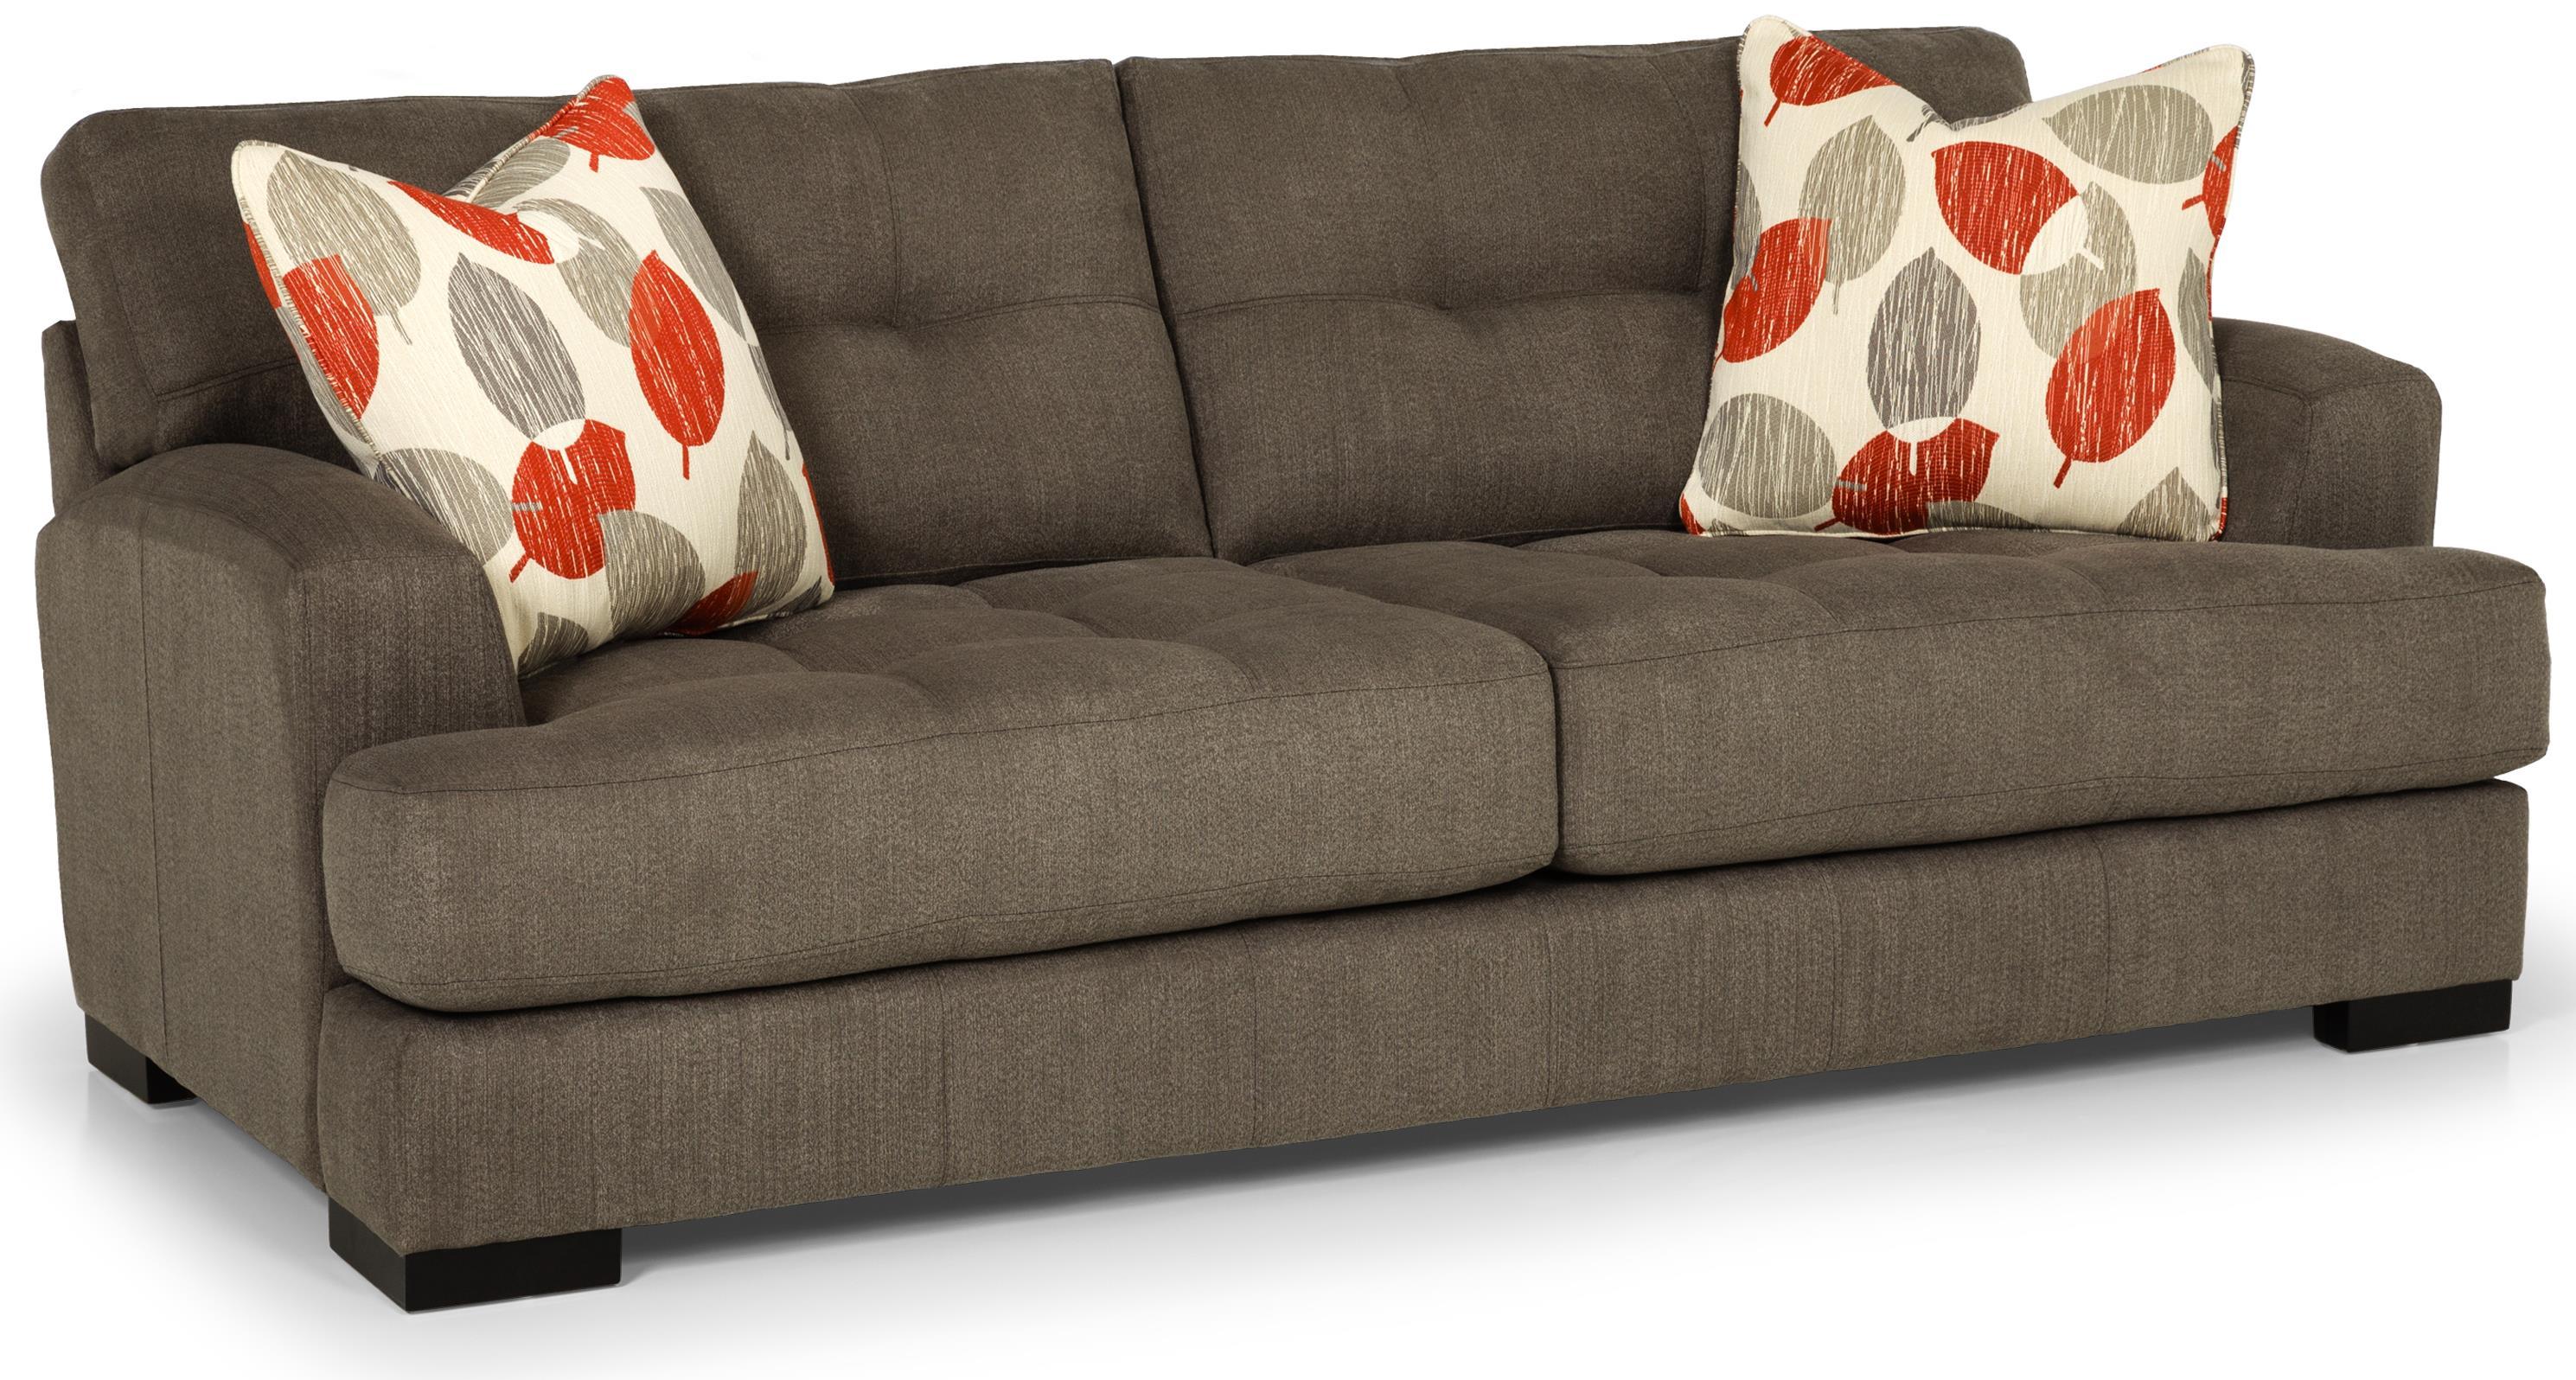 Stanton 308 Stationary Two Cushion Sofa